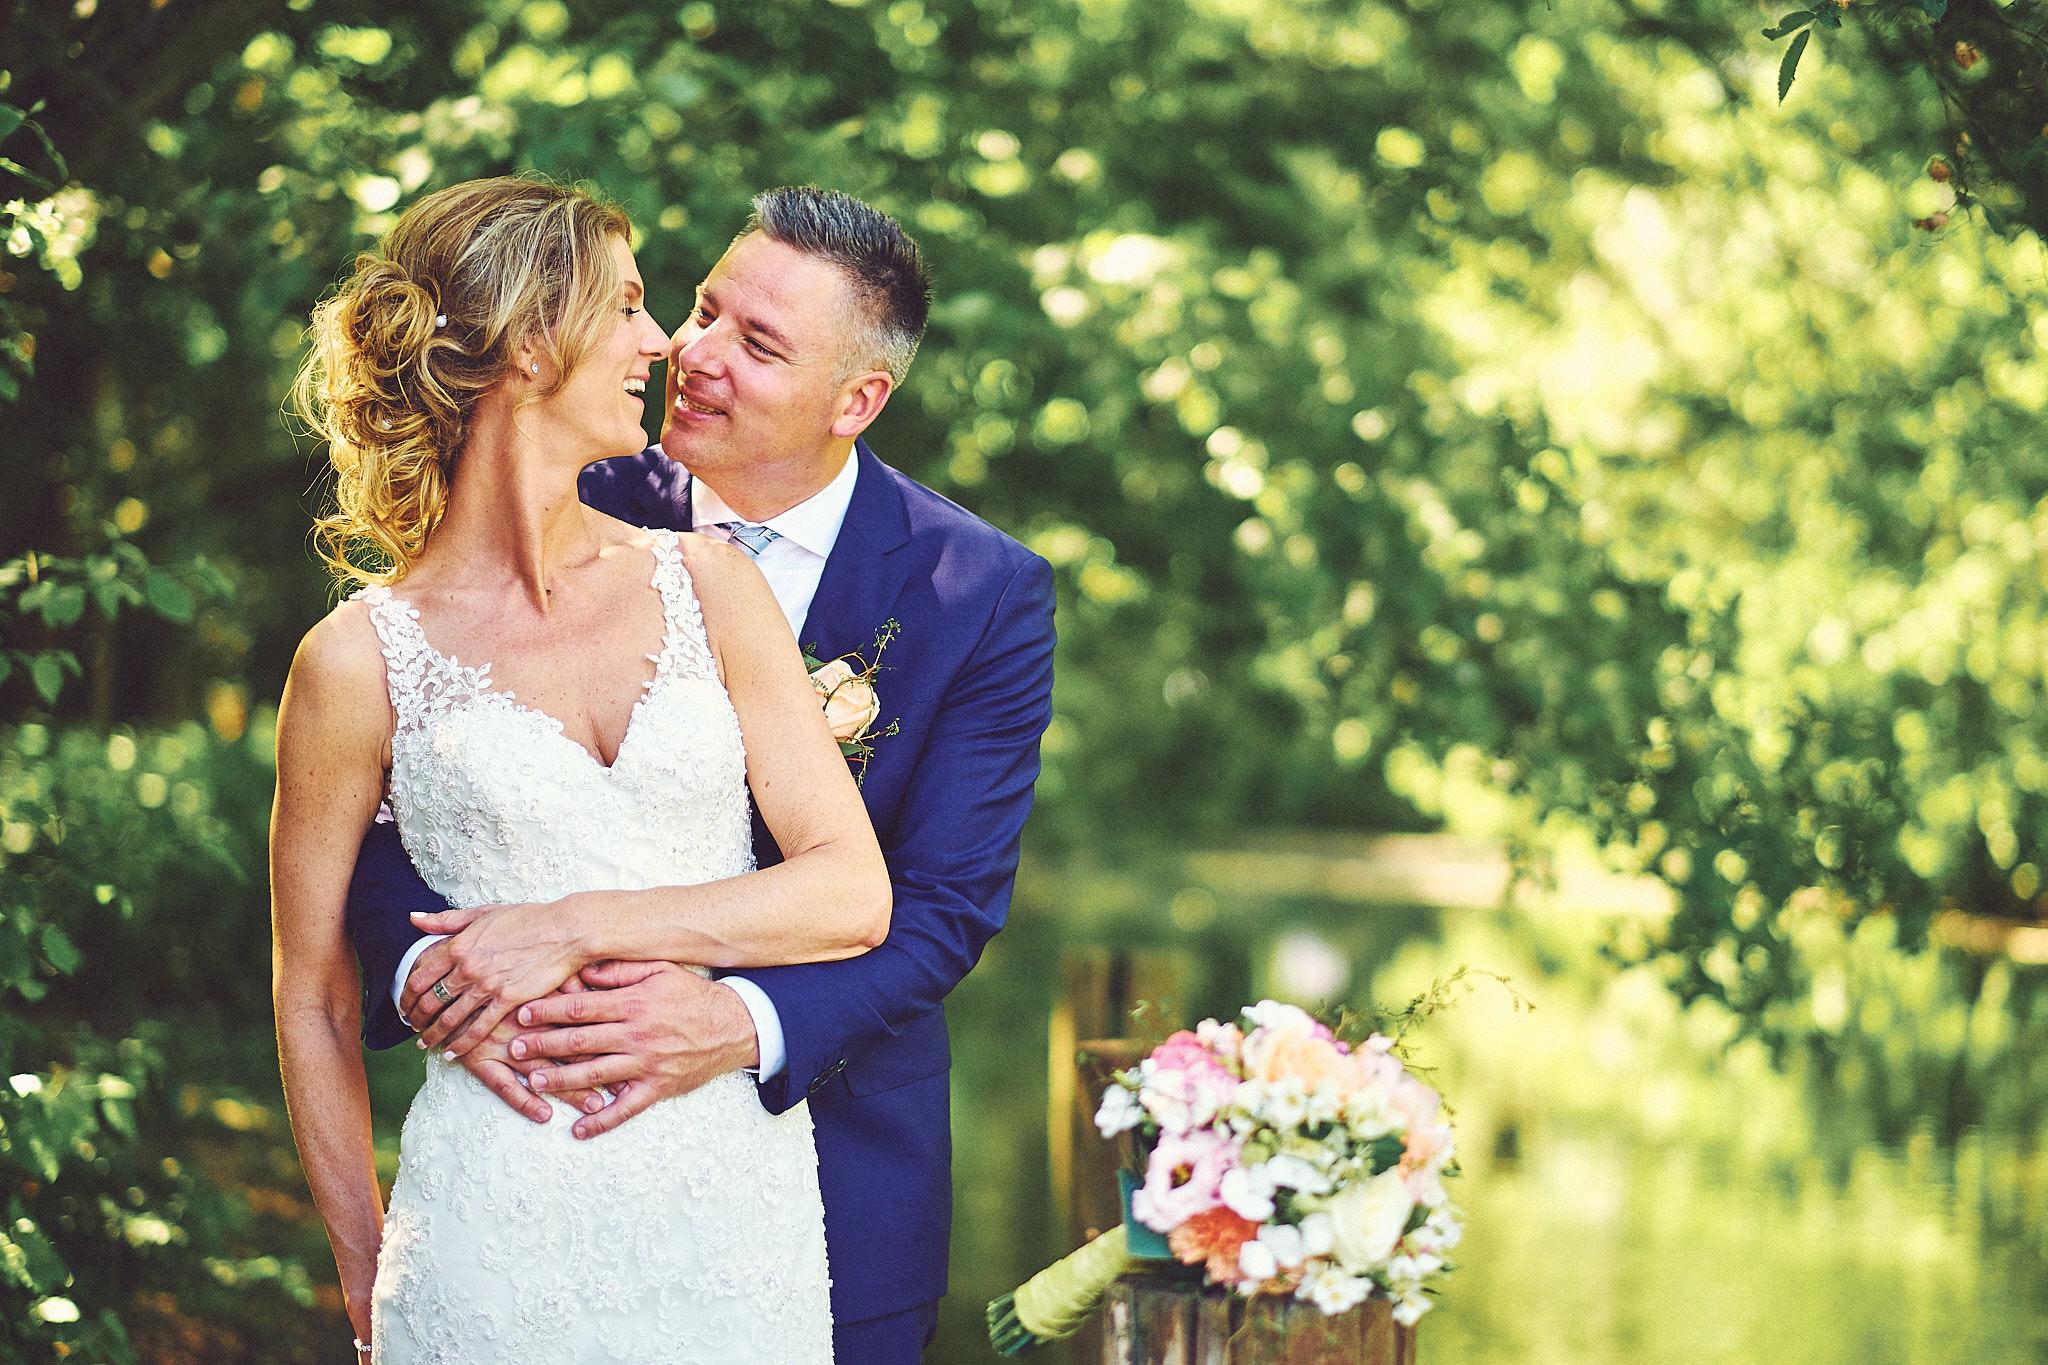 bruidsfotografie-trouwreportage-Delft-Ingrid-Richard_1434.jpg